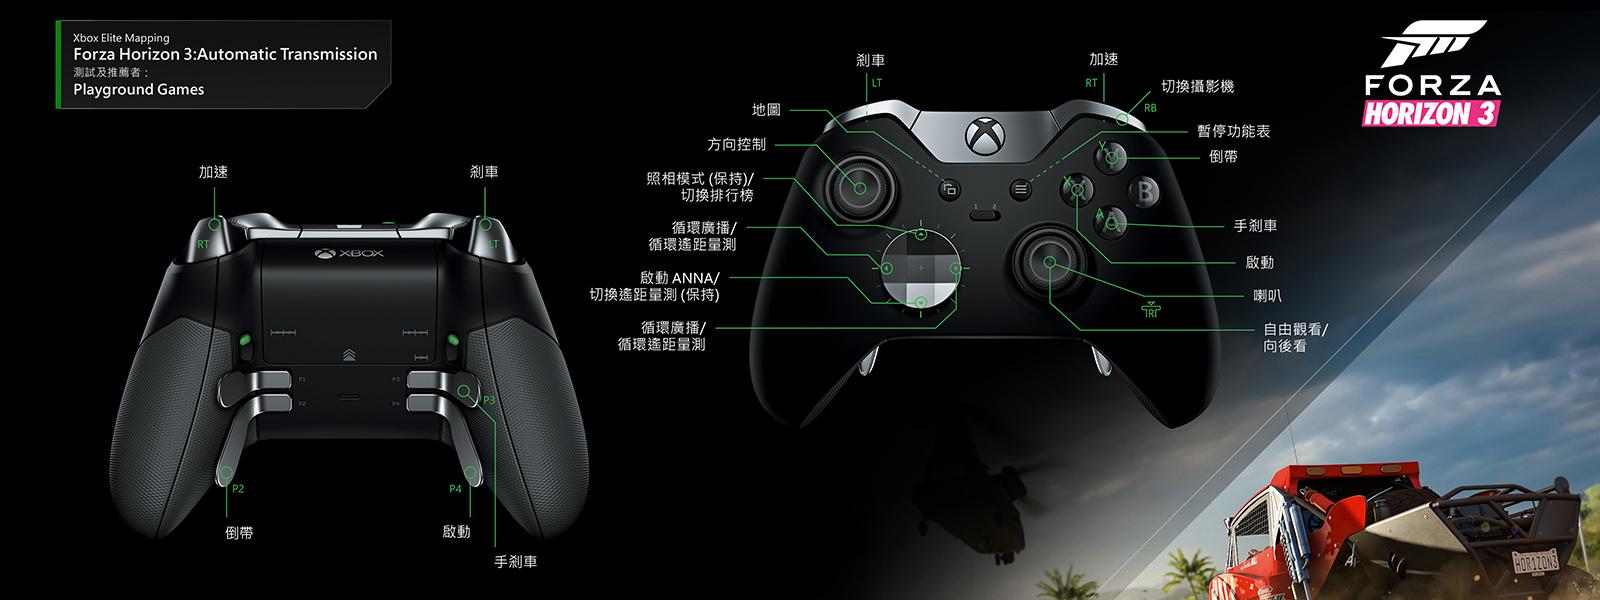 Forza Horizon 3 -Automatic Transmission Elite 配對功能